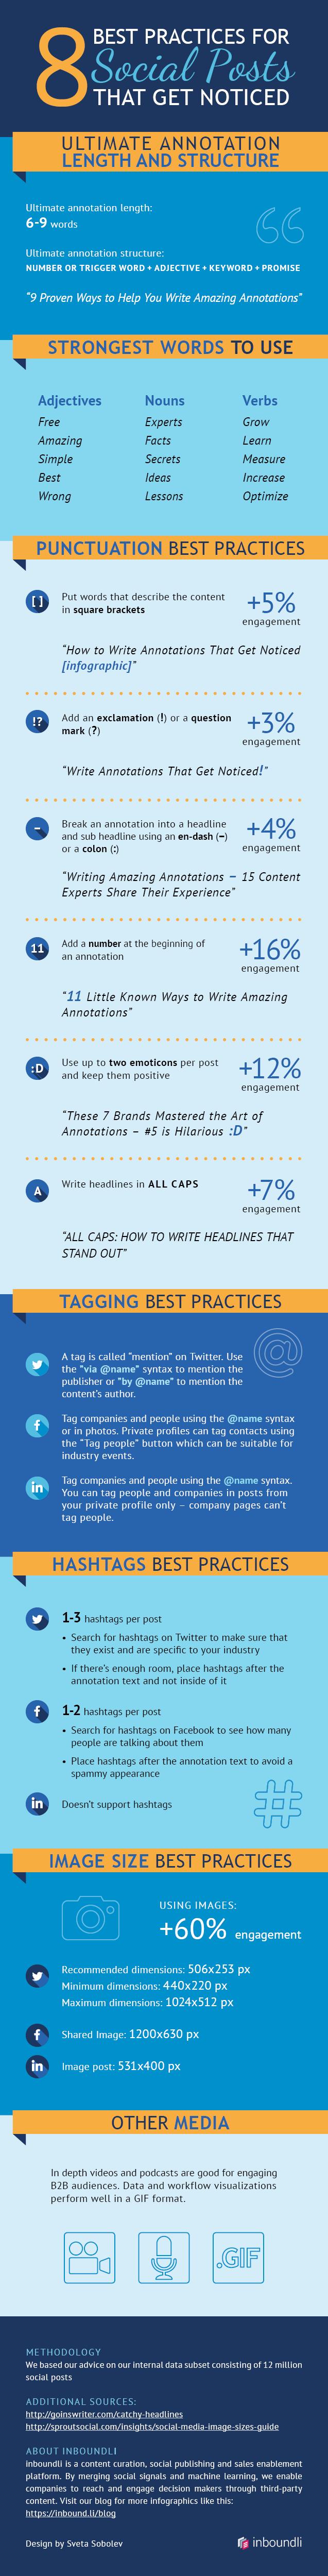 8 Social Media Posting Practices